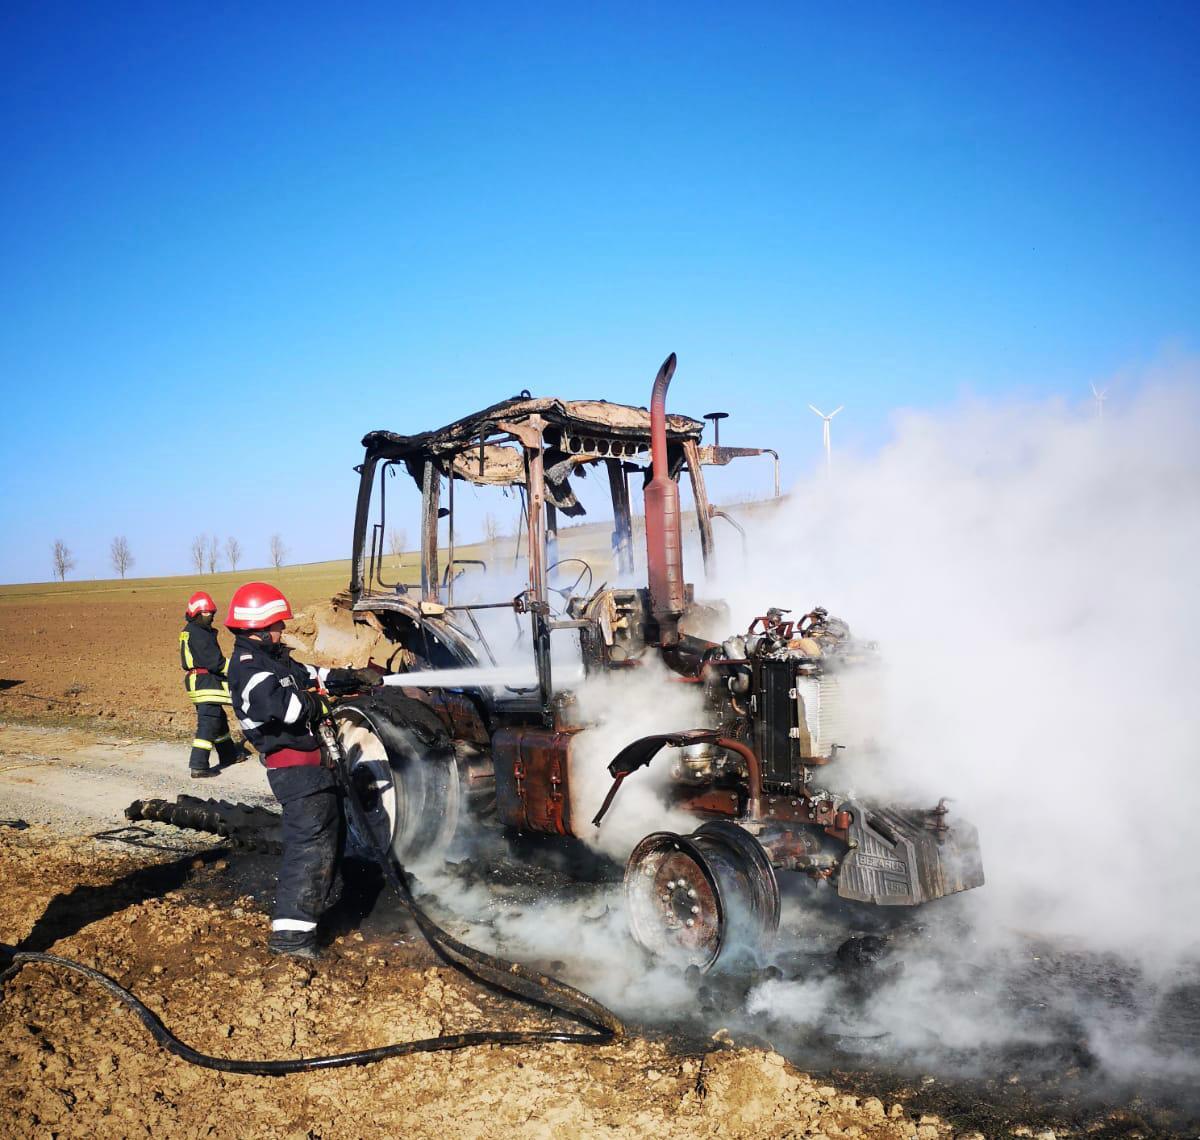 Tractor ars din cauza unui scurtcircuit electric